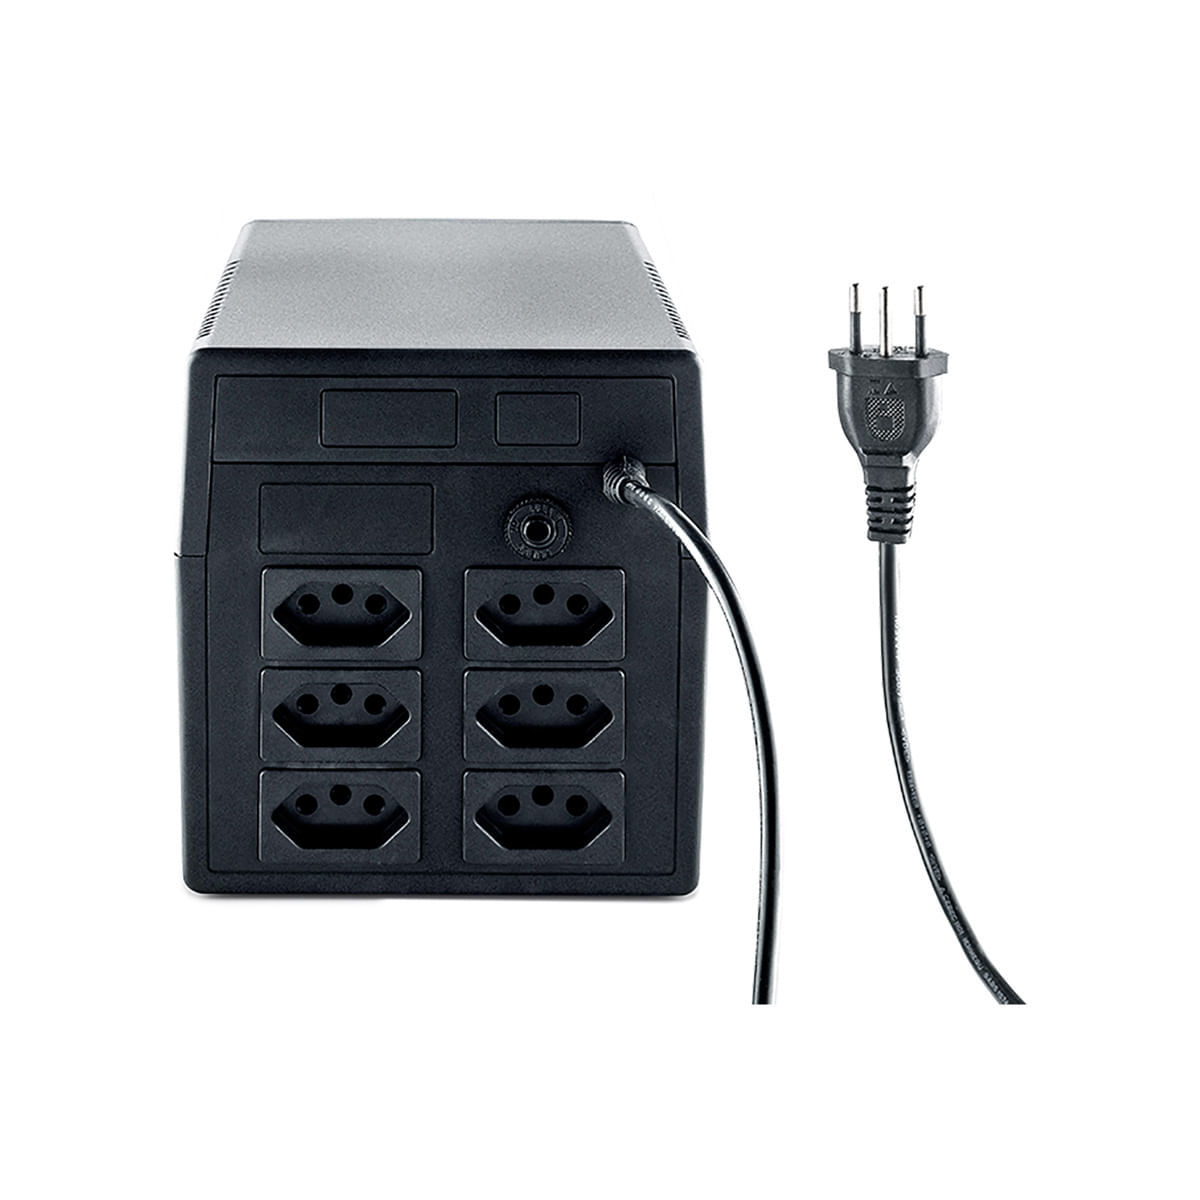 Nobreak Interativo Monovolt Intelbras XNB 1440Va 220V